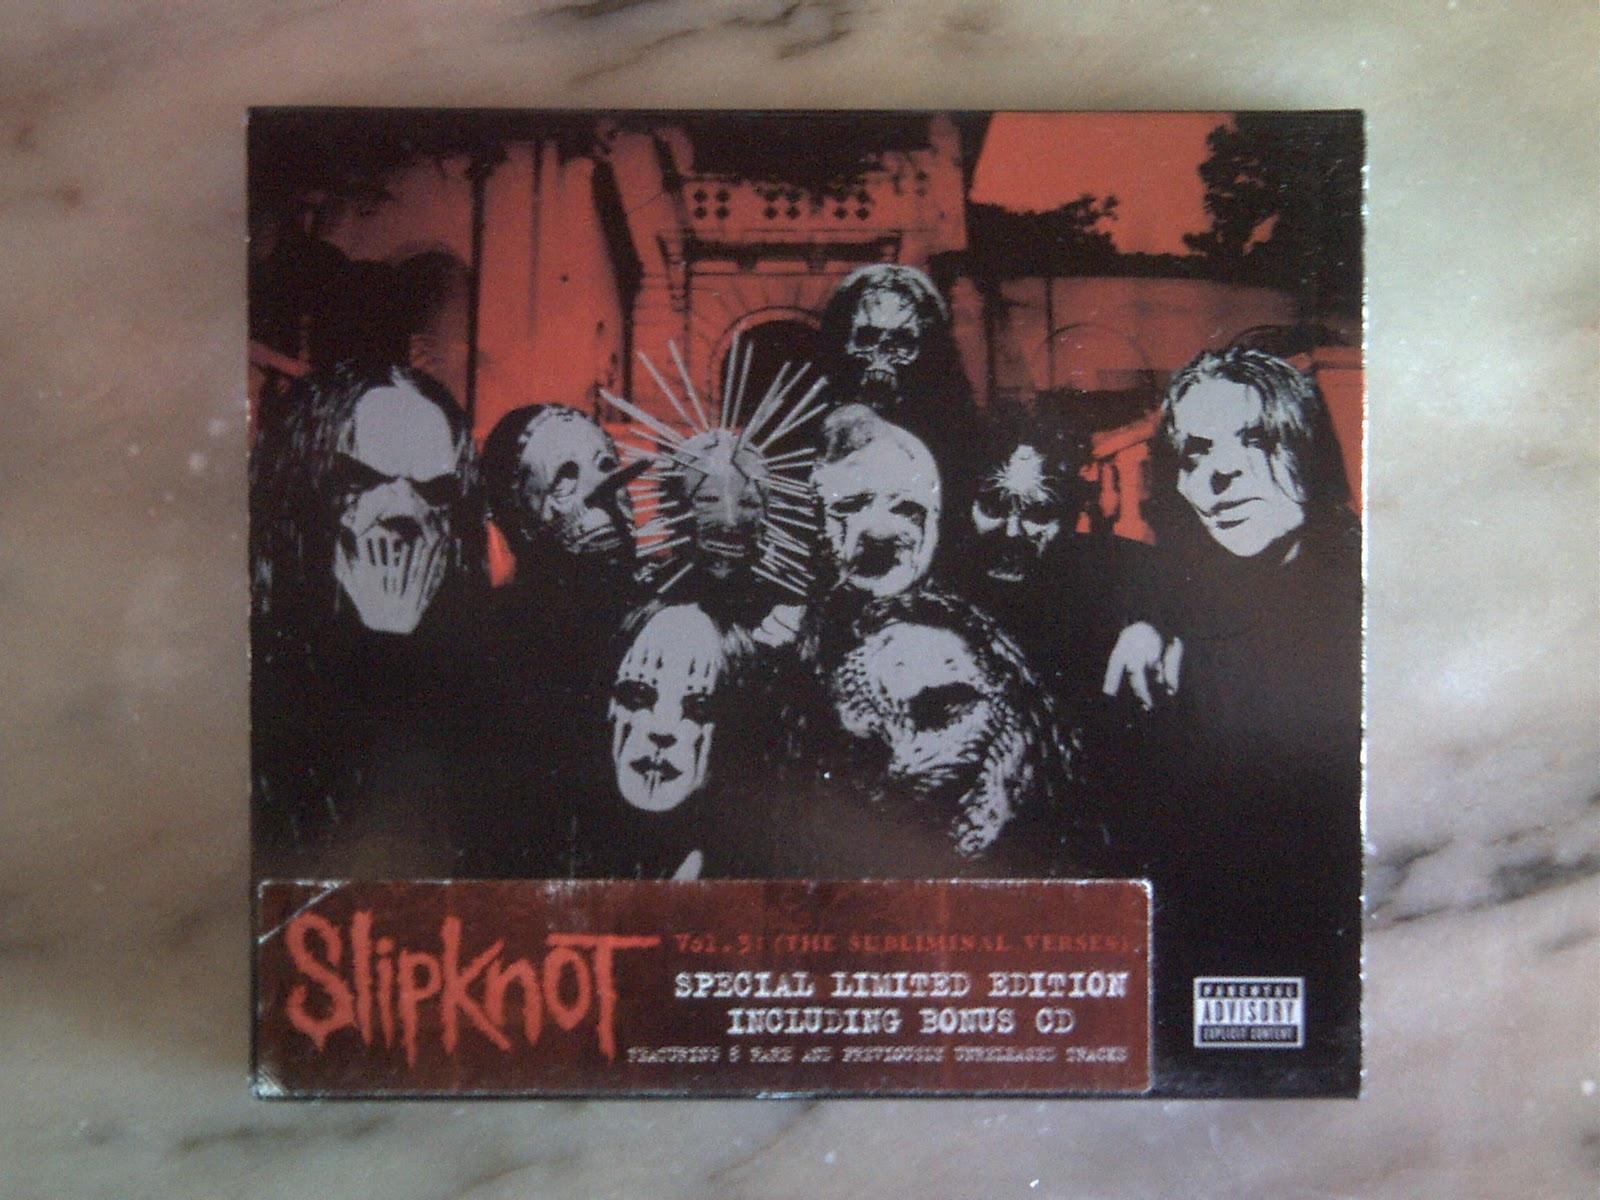 ALBUNS COLLECTION: Slipknot - Vol.3 (The Subliminal Verses ...